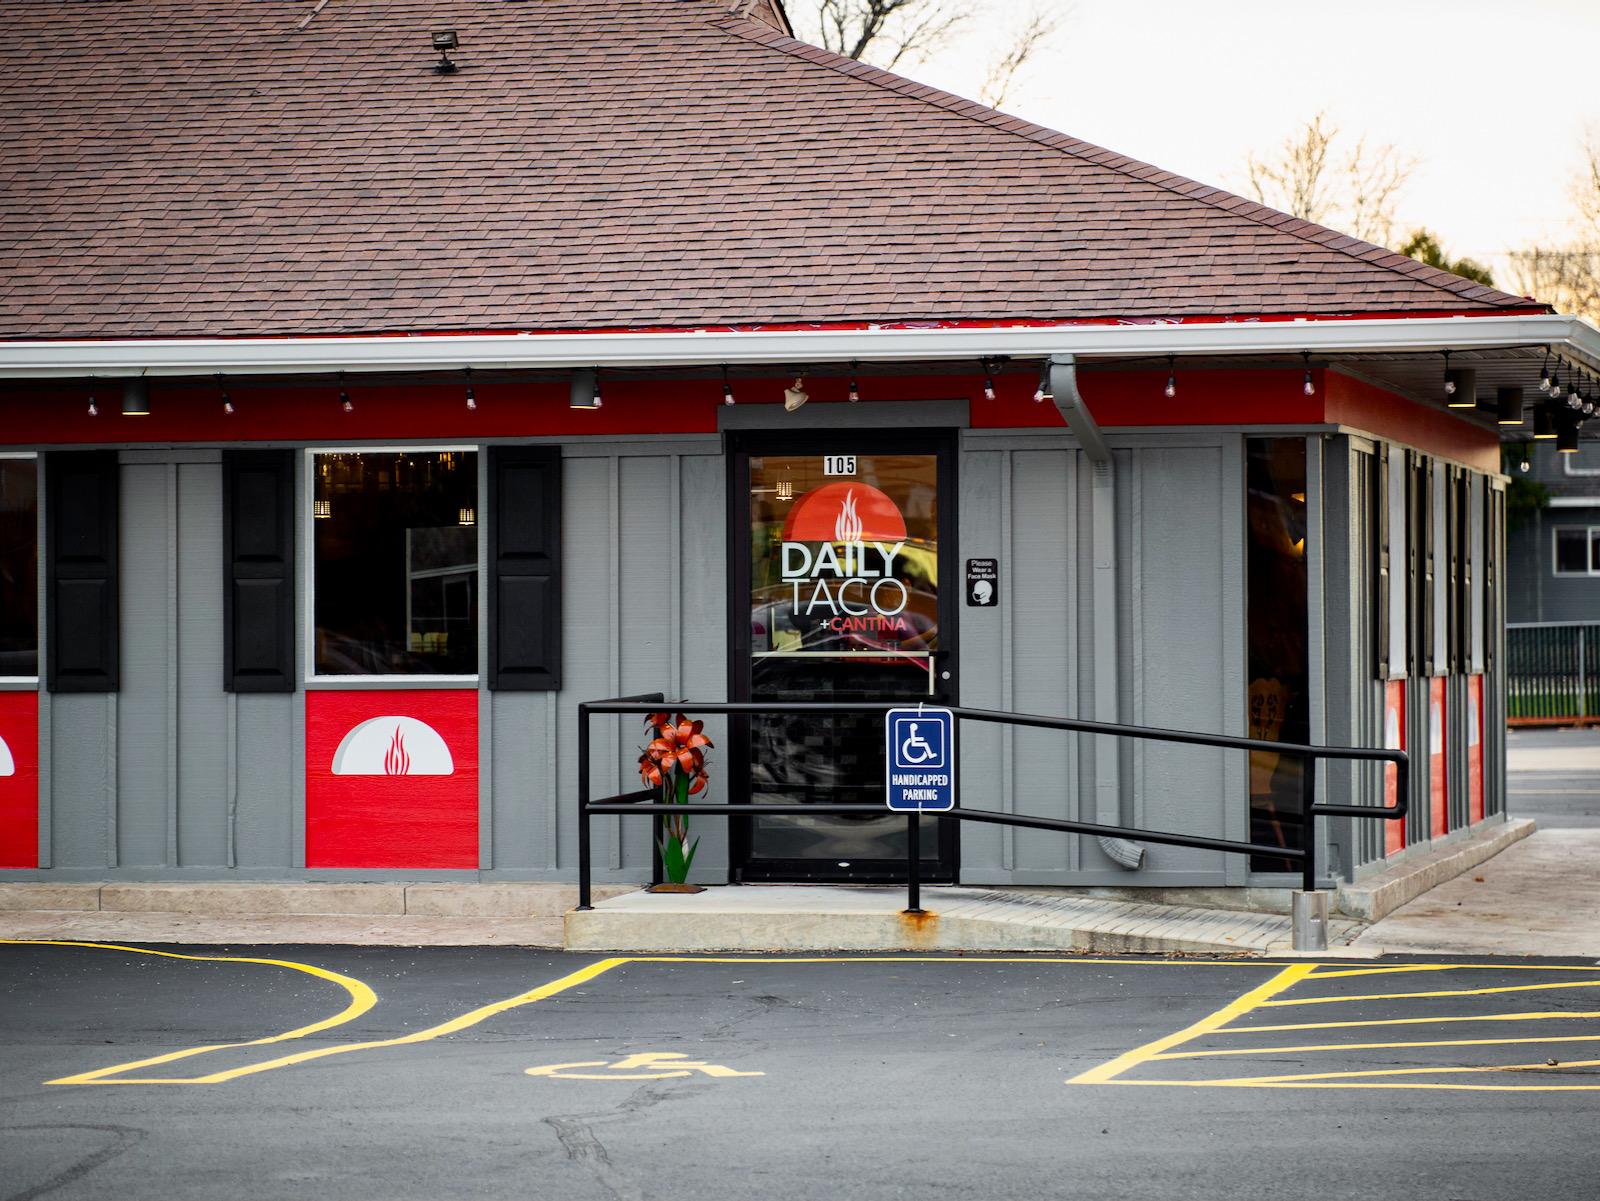 Daily Taco + Cantina exterior of restaurant